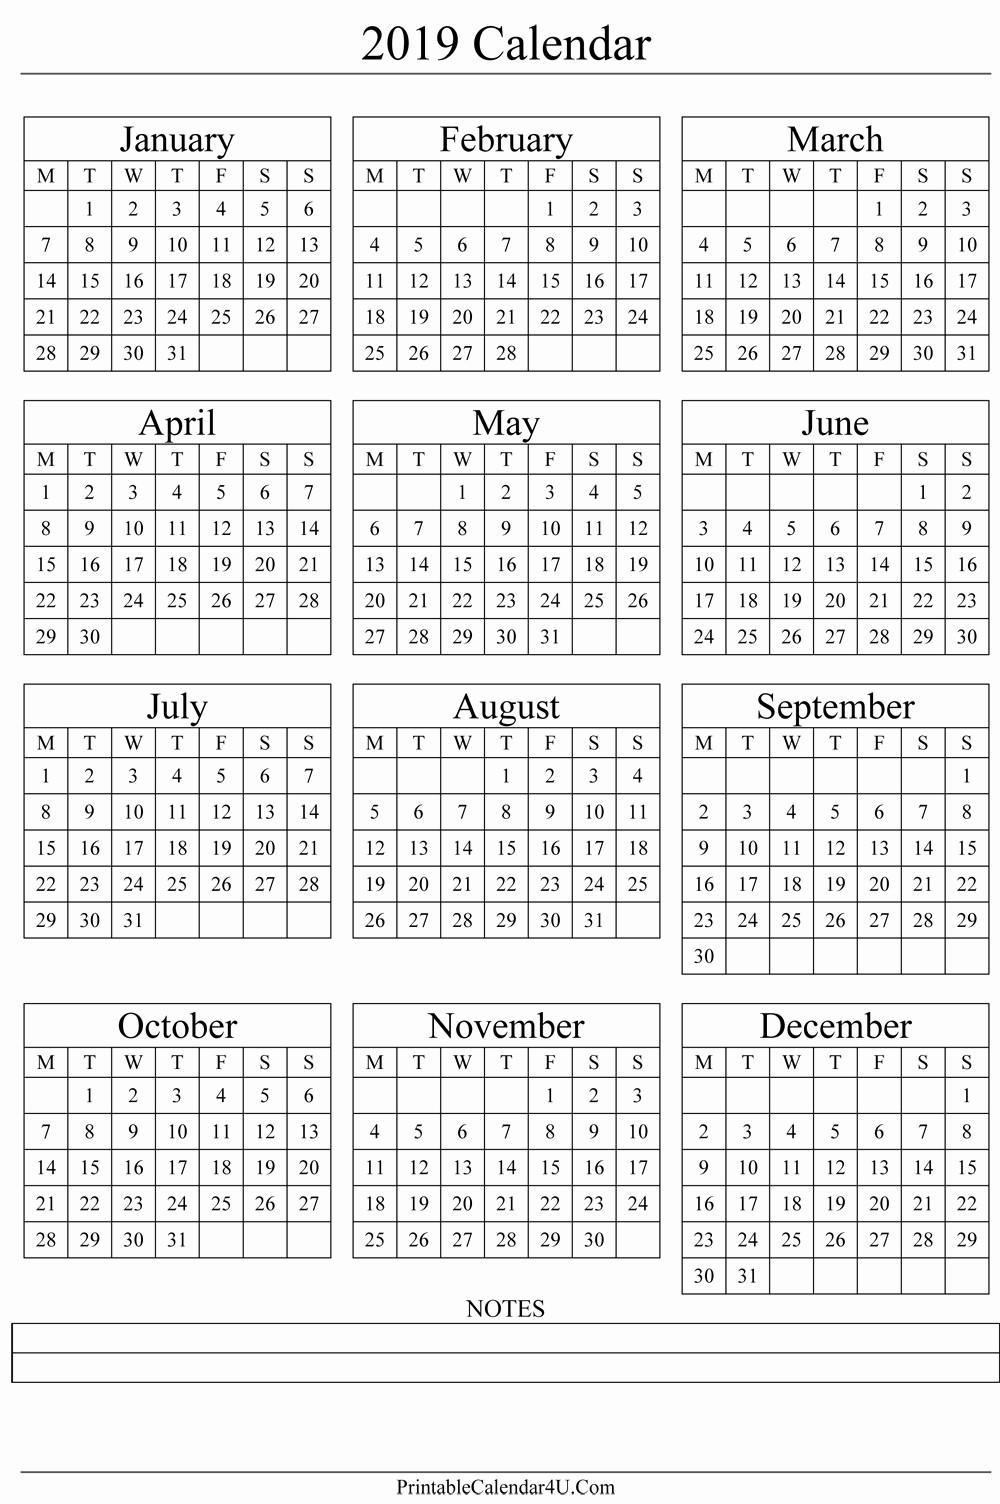 2019 Yearly Calendar One Page Fresh Annual Calendar 2019 Portrait Printable Calendar 2019 2020